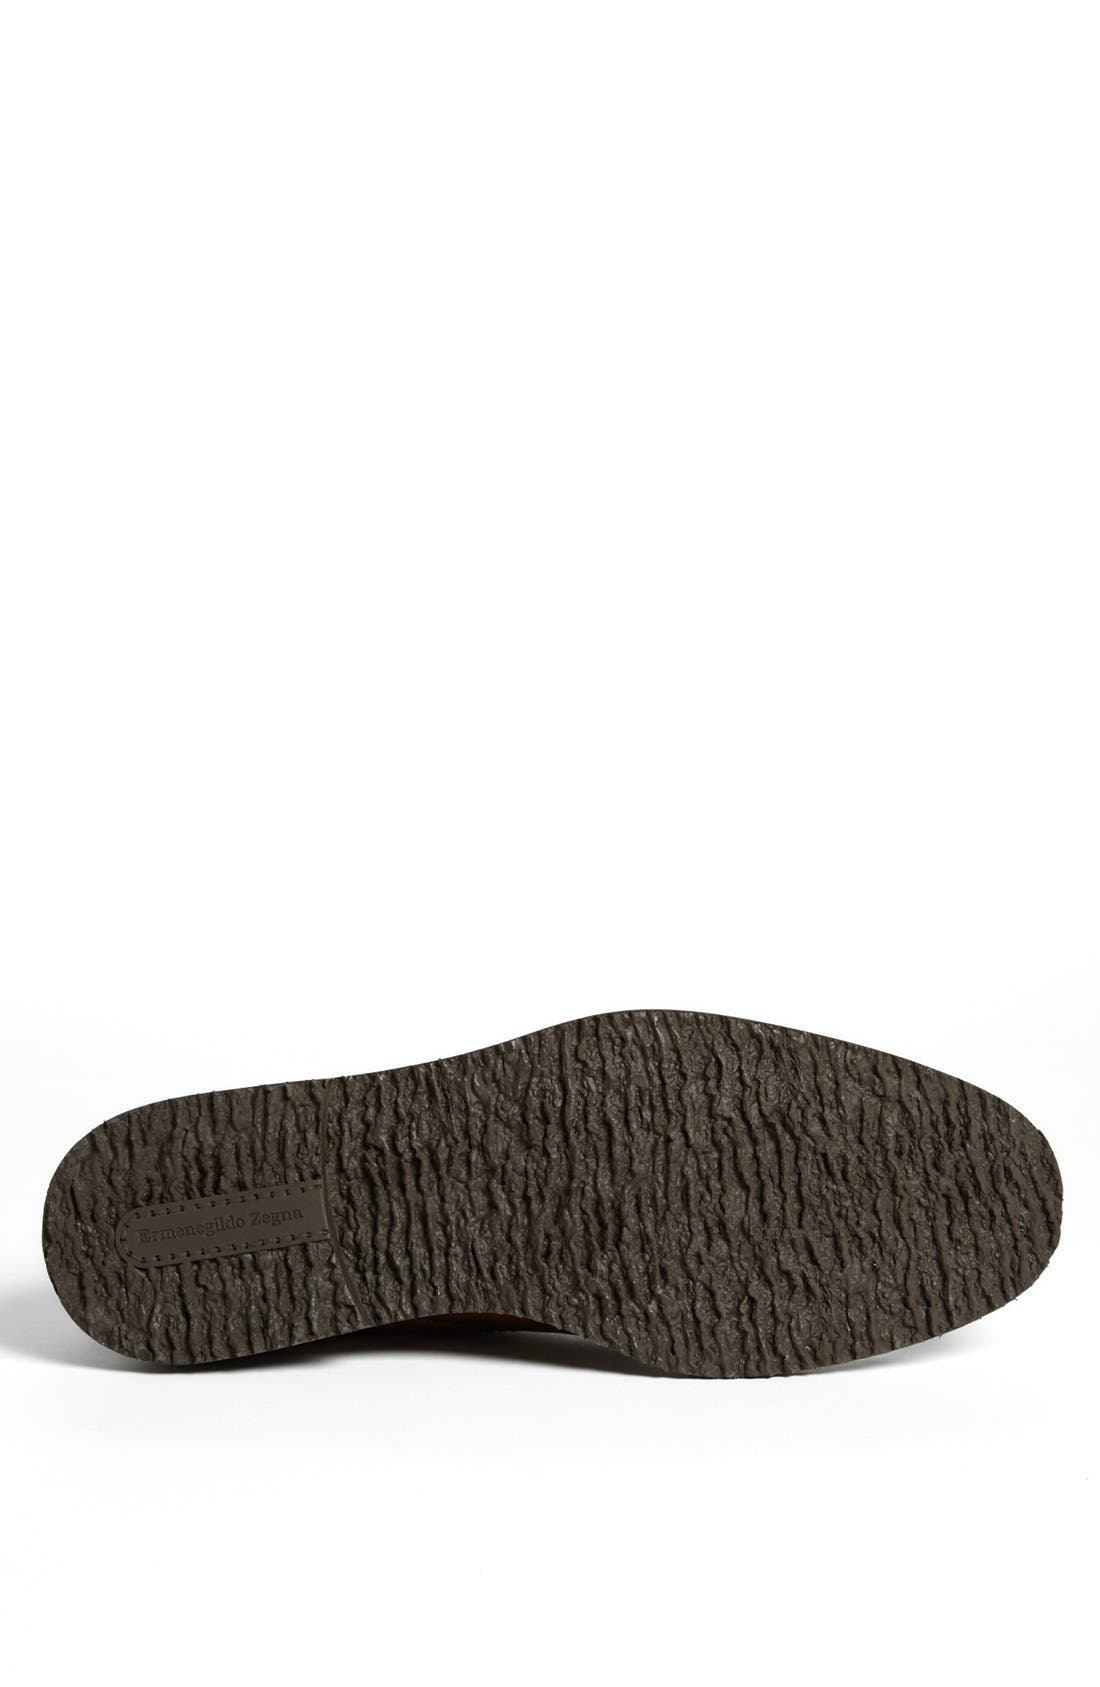 Alternate Image 4  - Ermenegildo Zegna Leather Chukka Boot